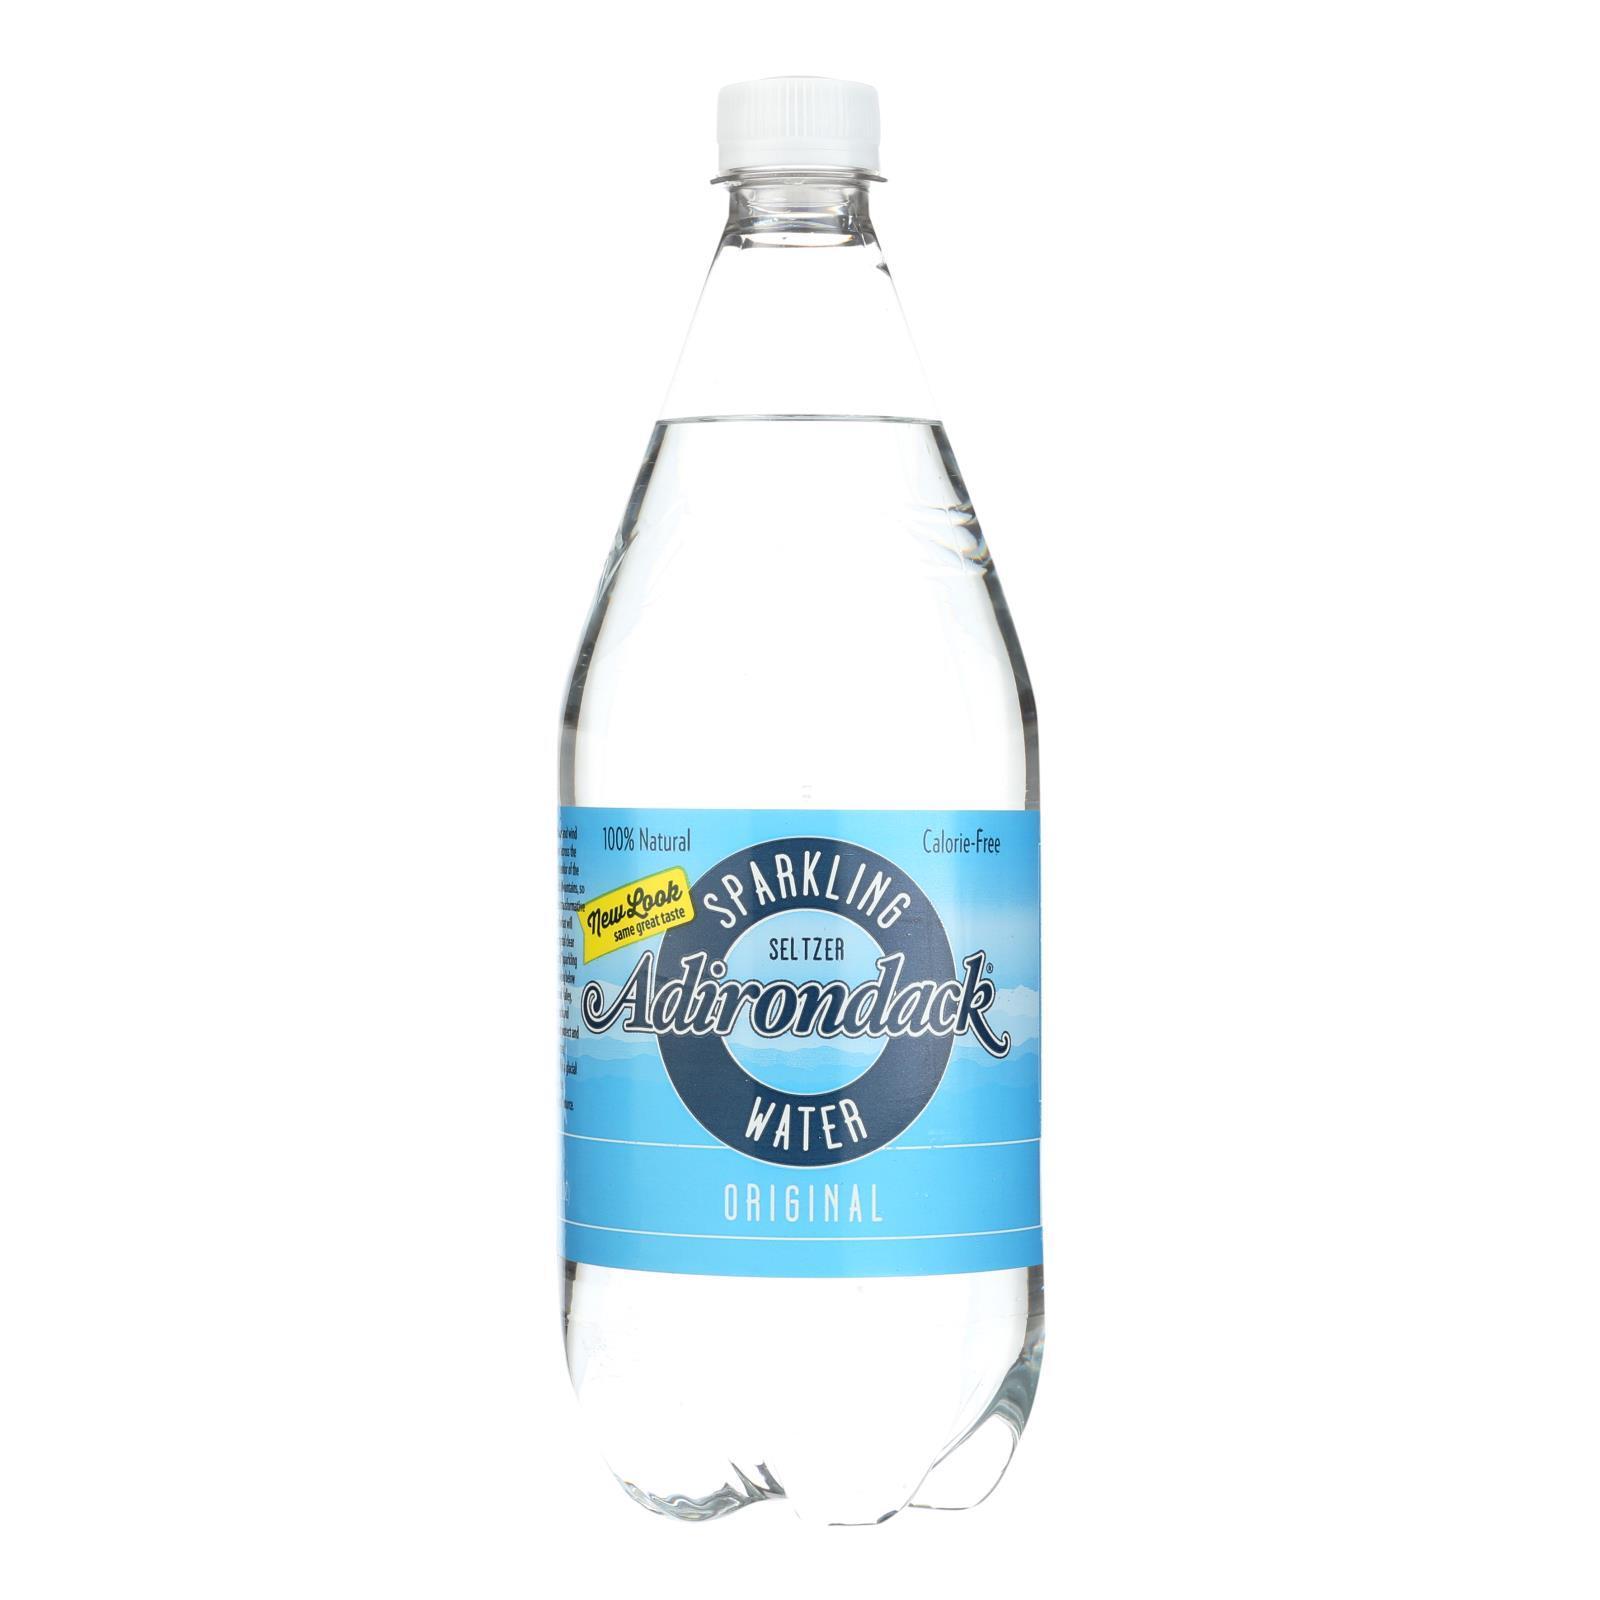 Naturals Adirondack Seltzer - Original - Case of 12 - 33.8 Fl oz.